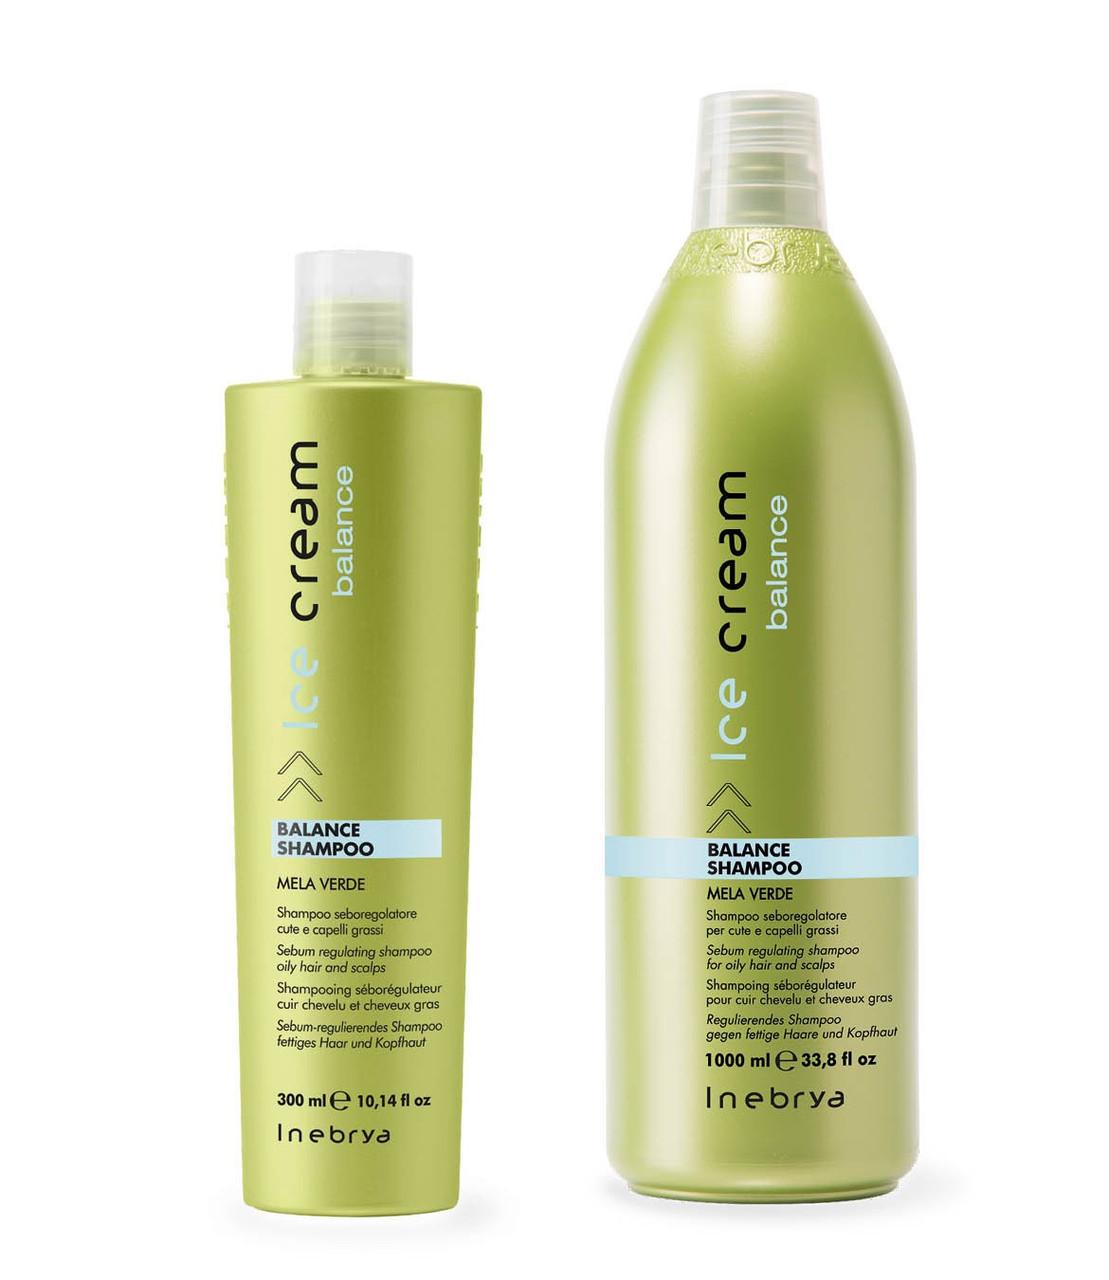 Шампунь для жирной кожи головы Inebrya Ice Cream Balance Shampoo, 300 мл